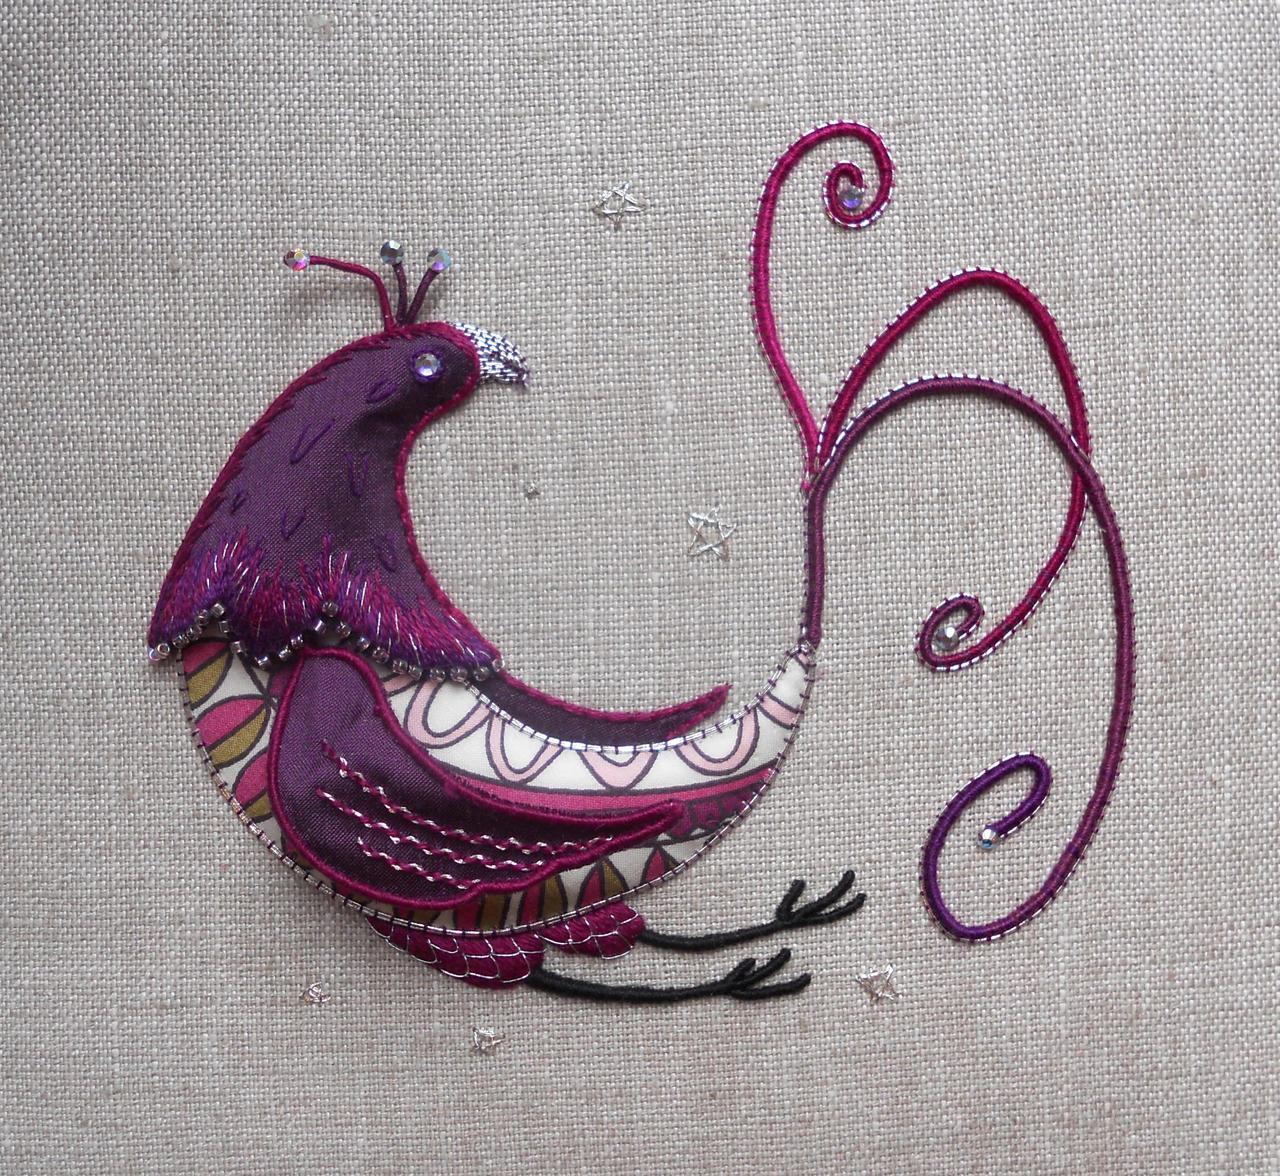 Paradise Bird Stumpwork Embroidery by MasonBee